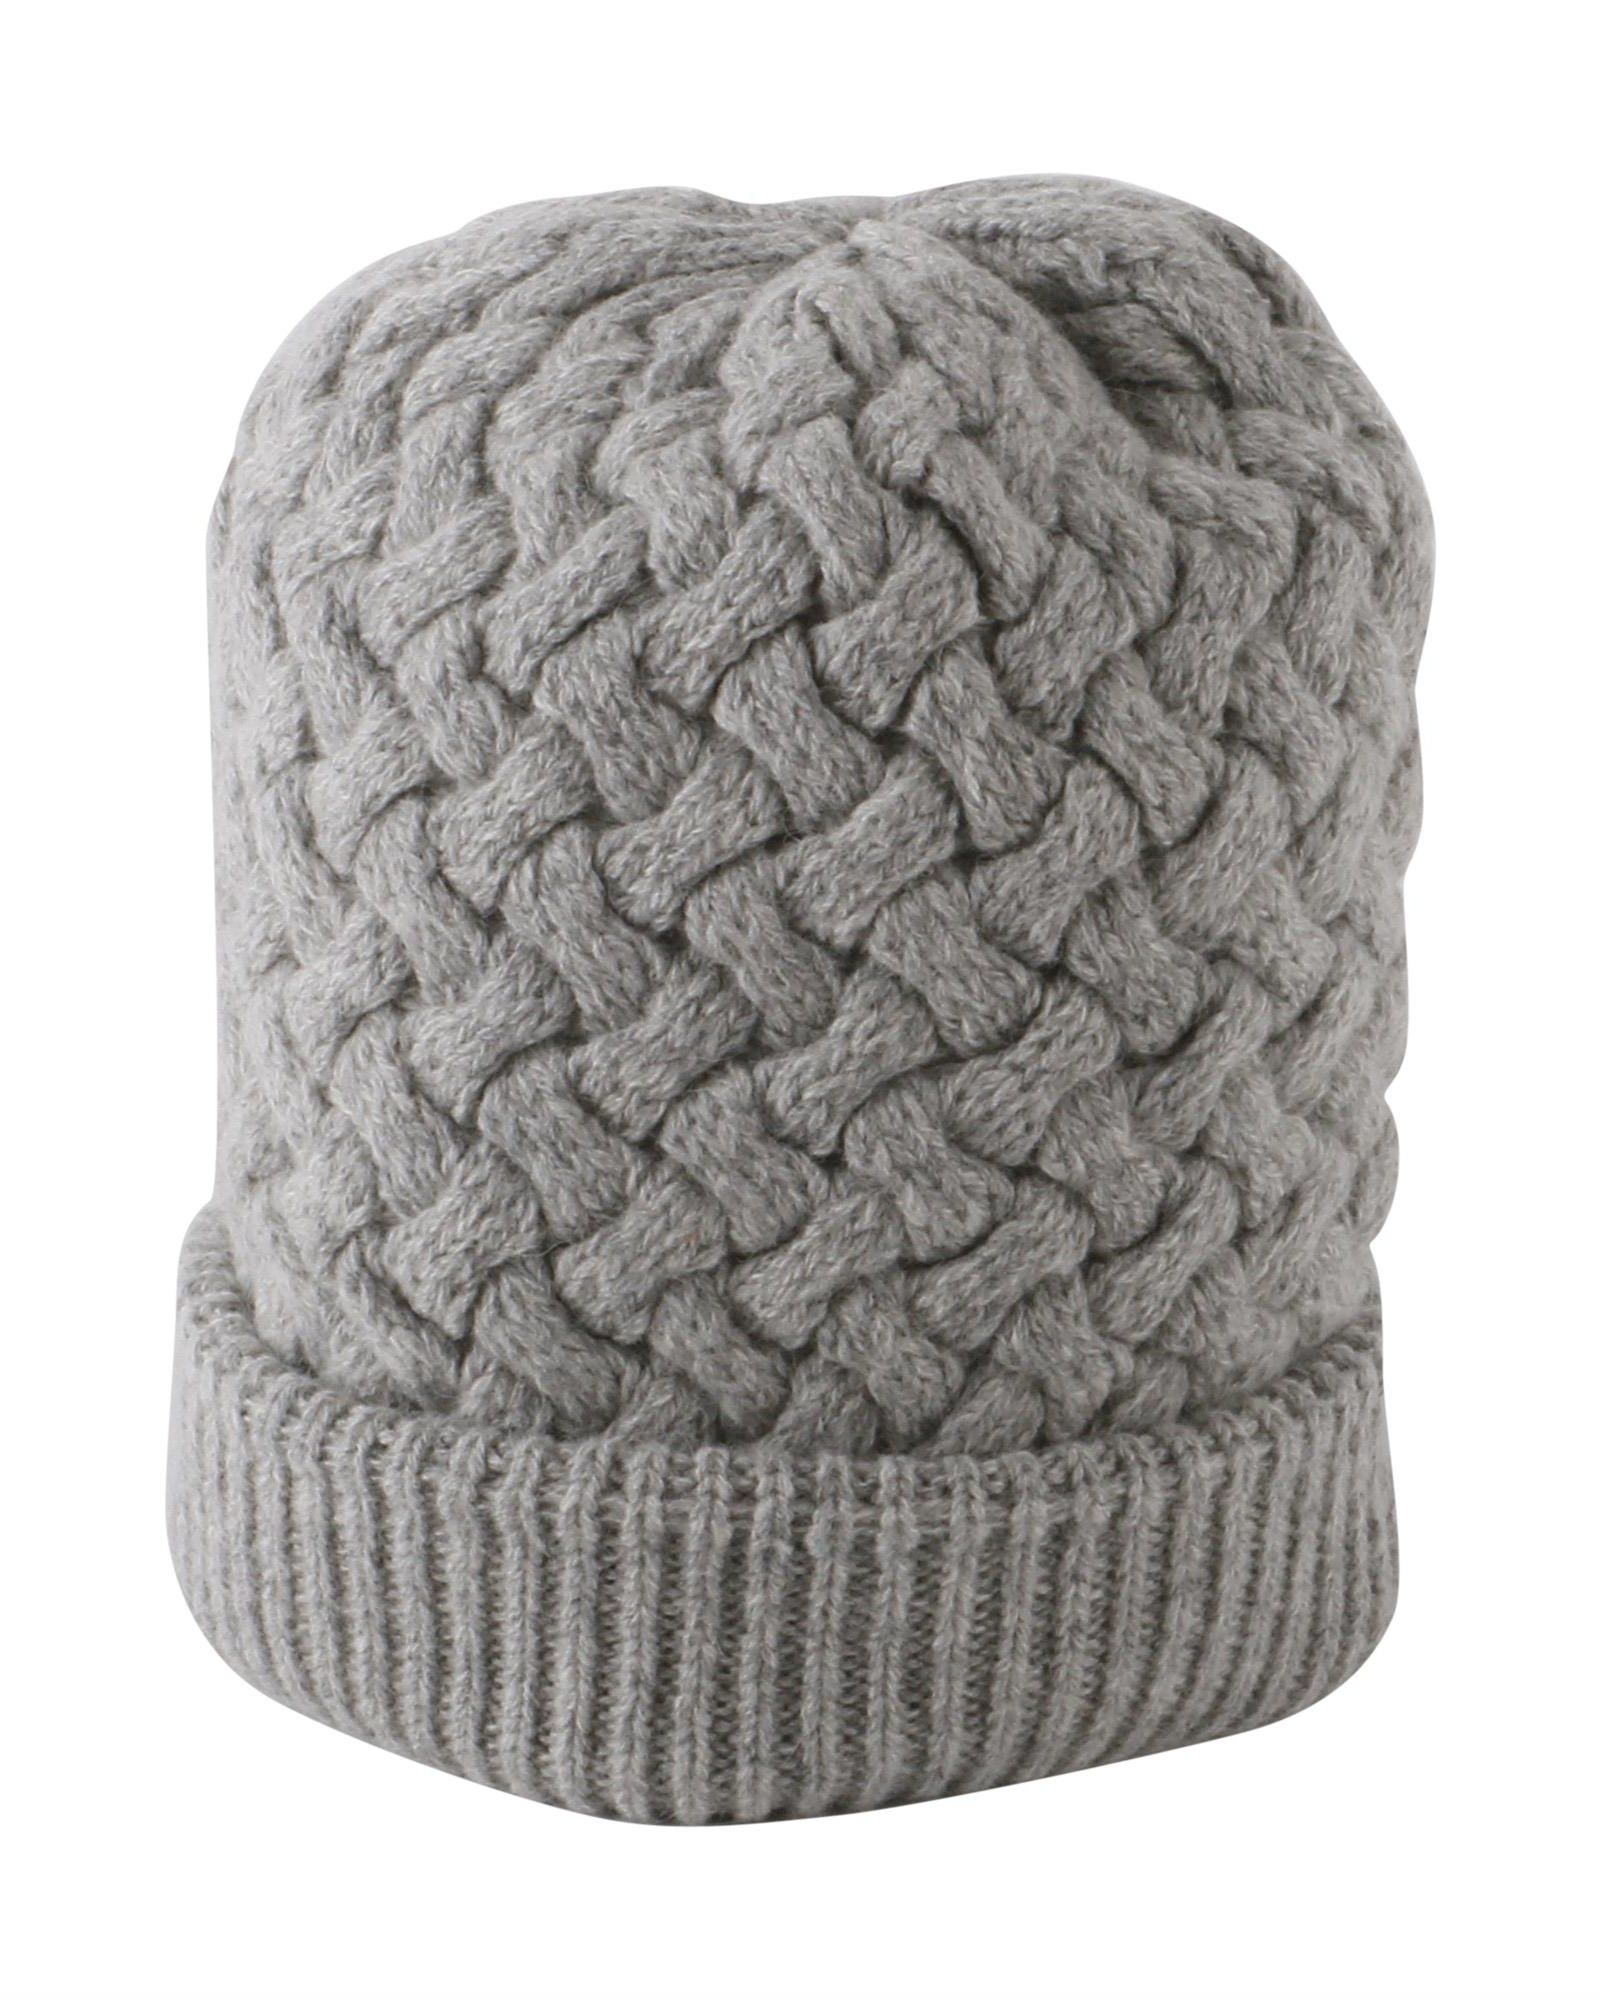 DANIELE FIESOLI Baby Alpaca Blend Hat in Grey